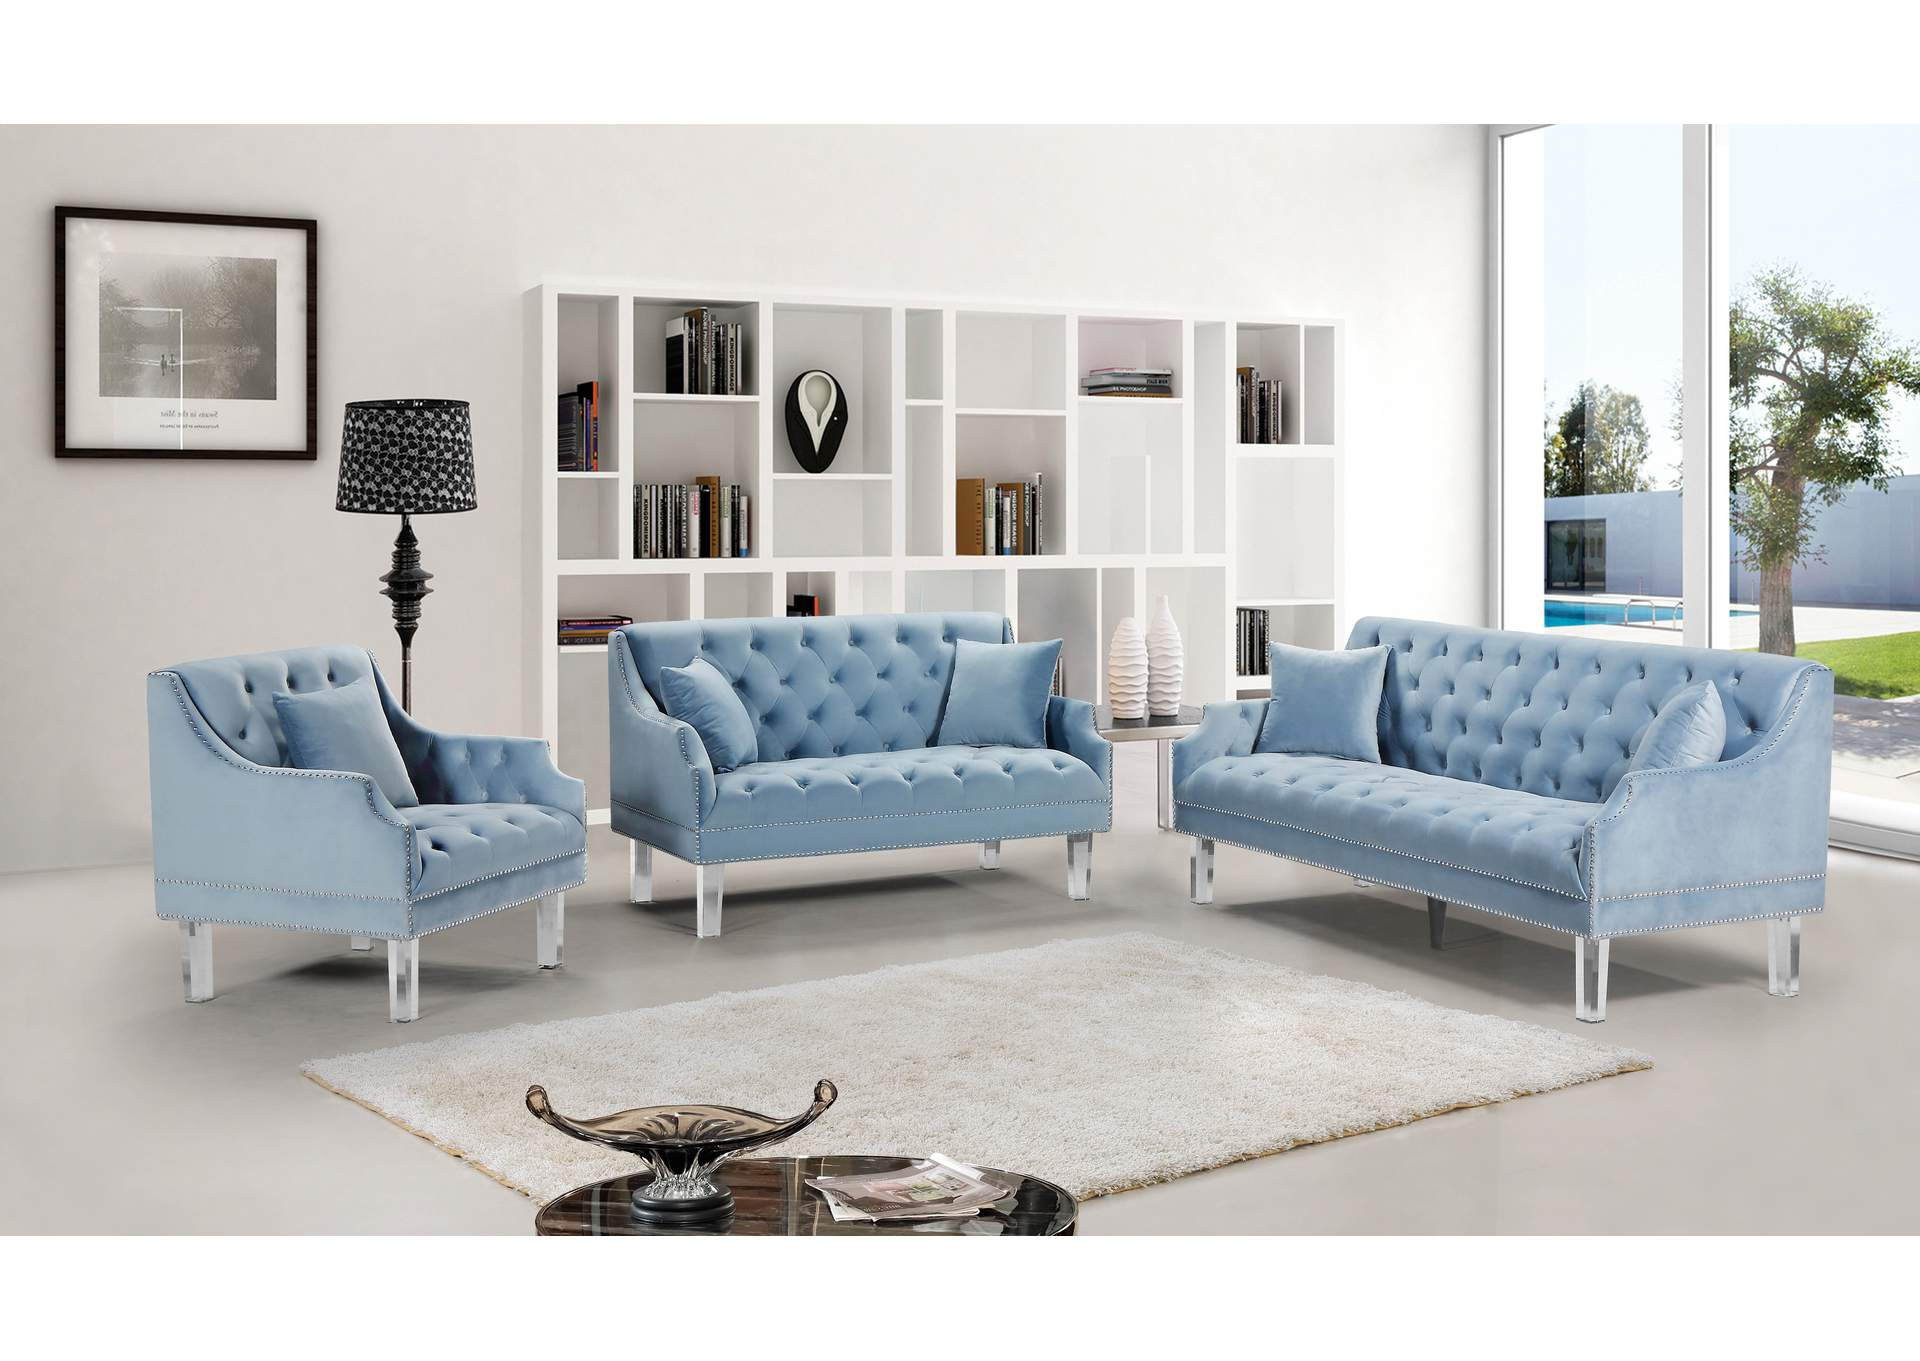 Roxy Sky Blue Velvet Sofa And Loveseat Best Buy Furniture And Mattress